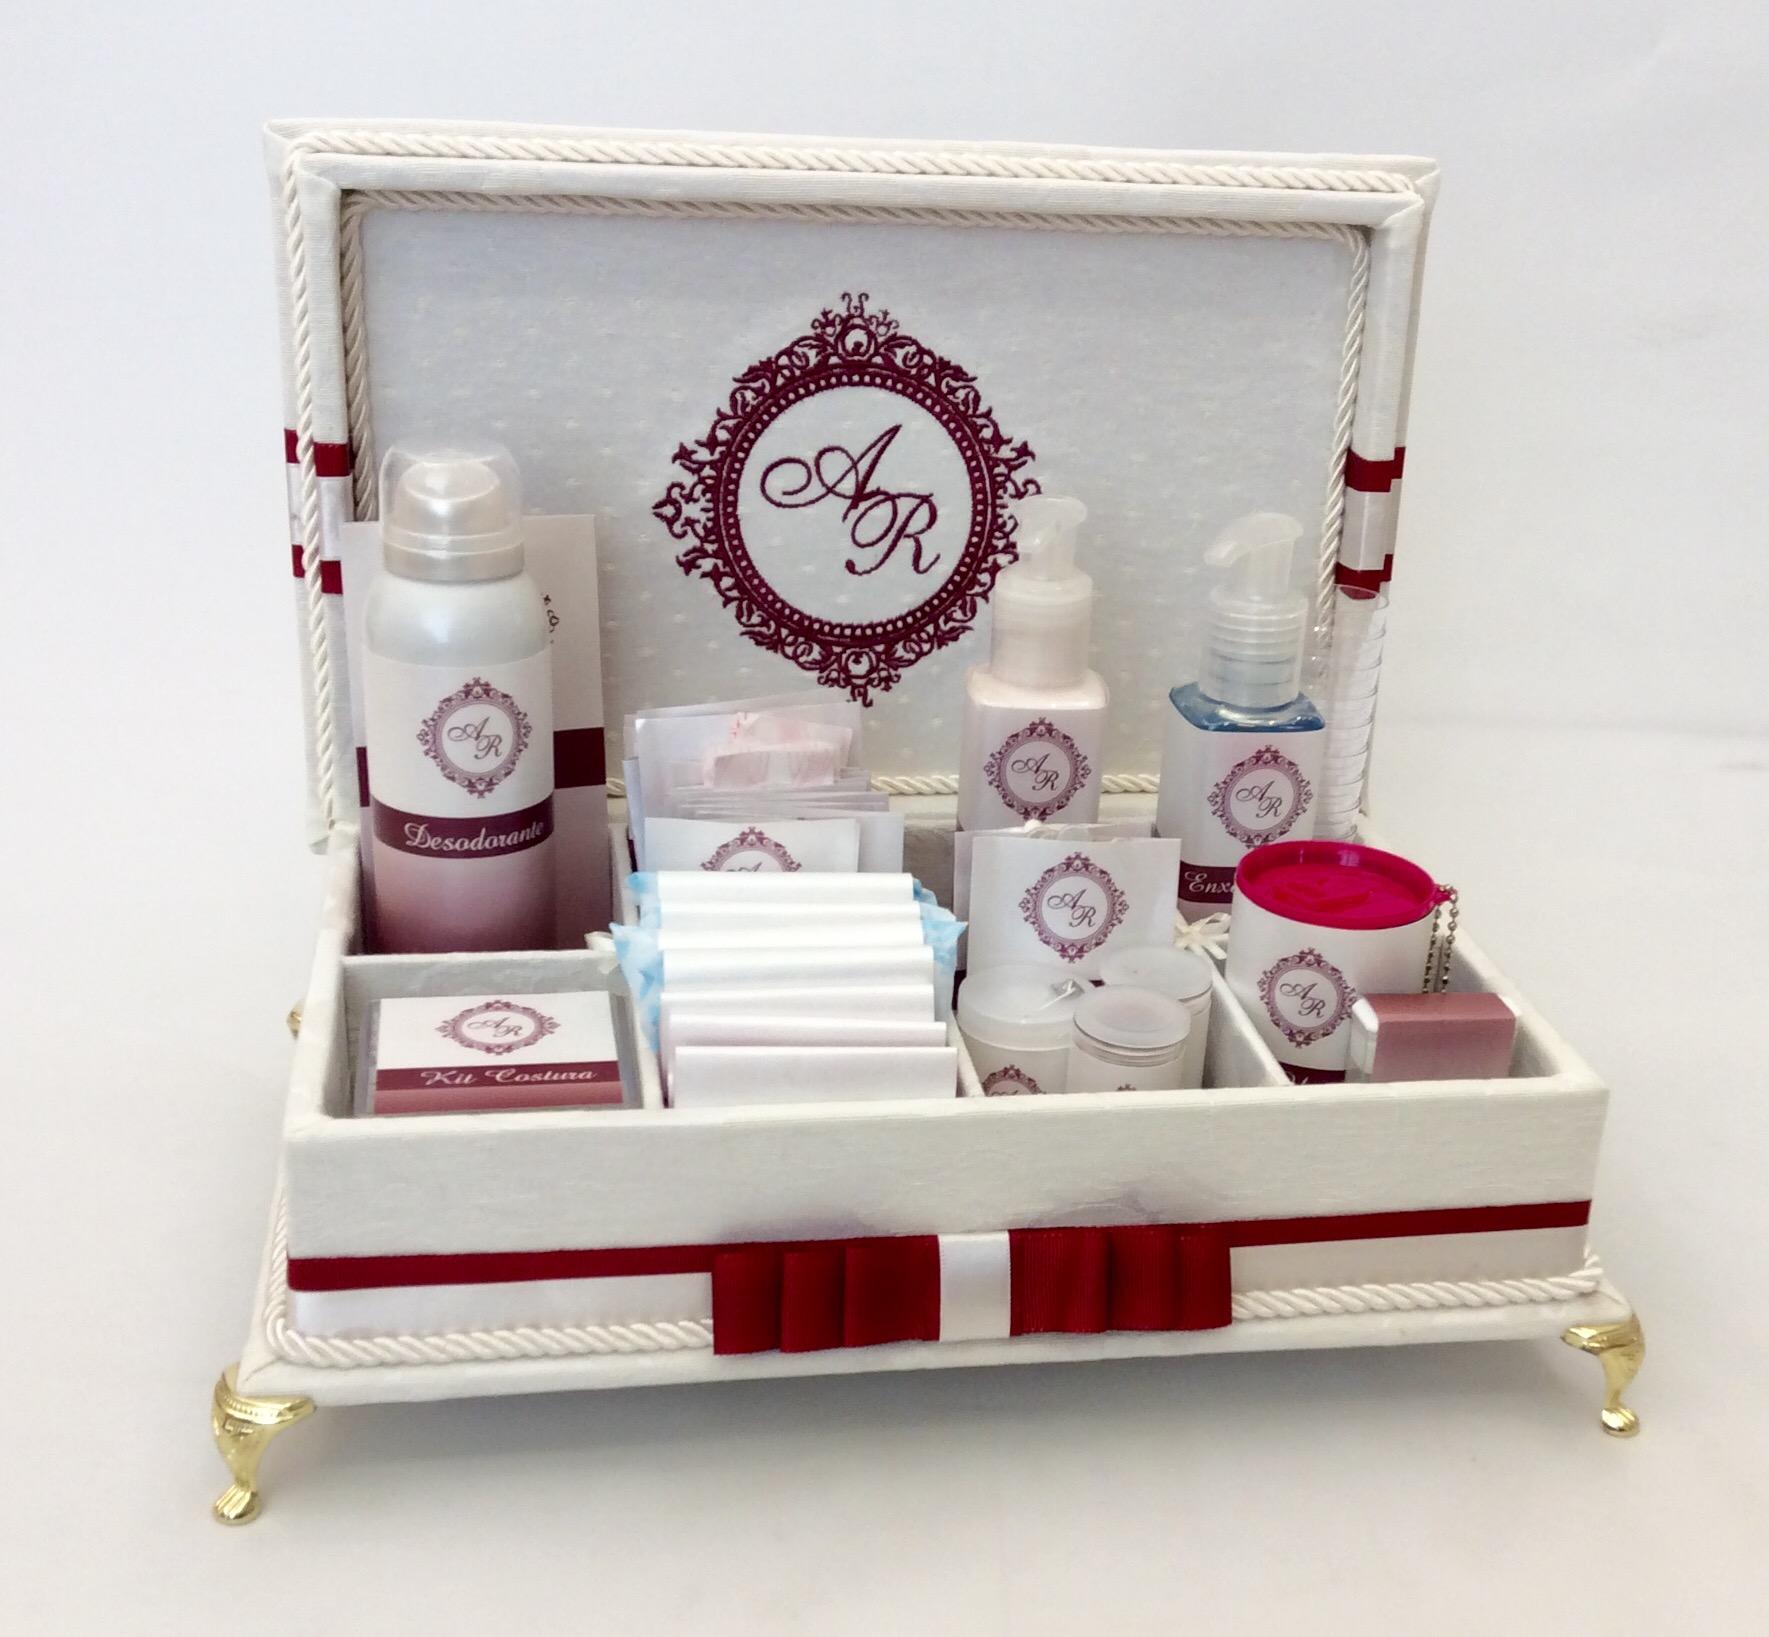 Kit Banheiro Para Casamento Goiania : Caixa kit toillet para casamentos divina elo